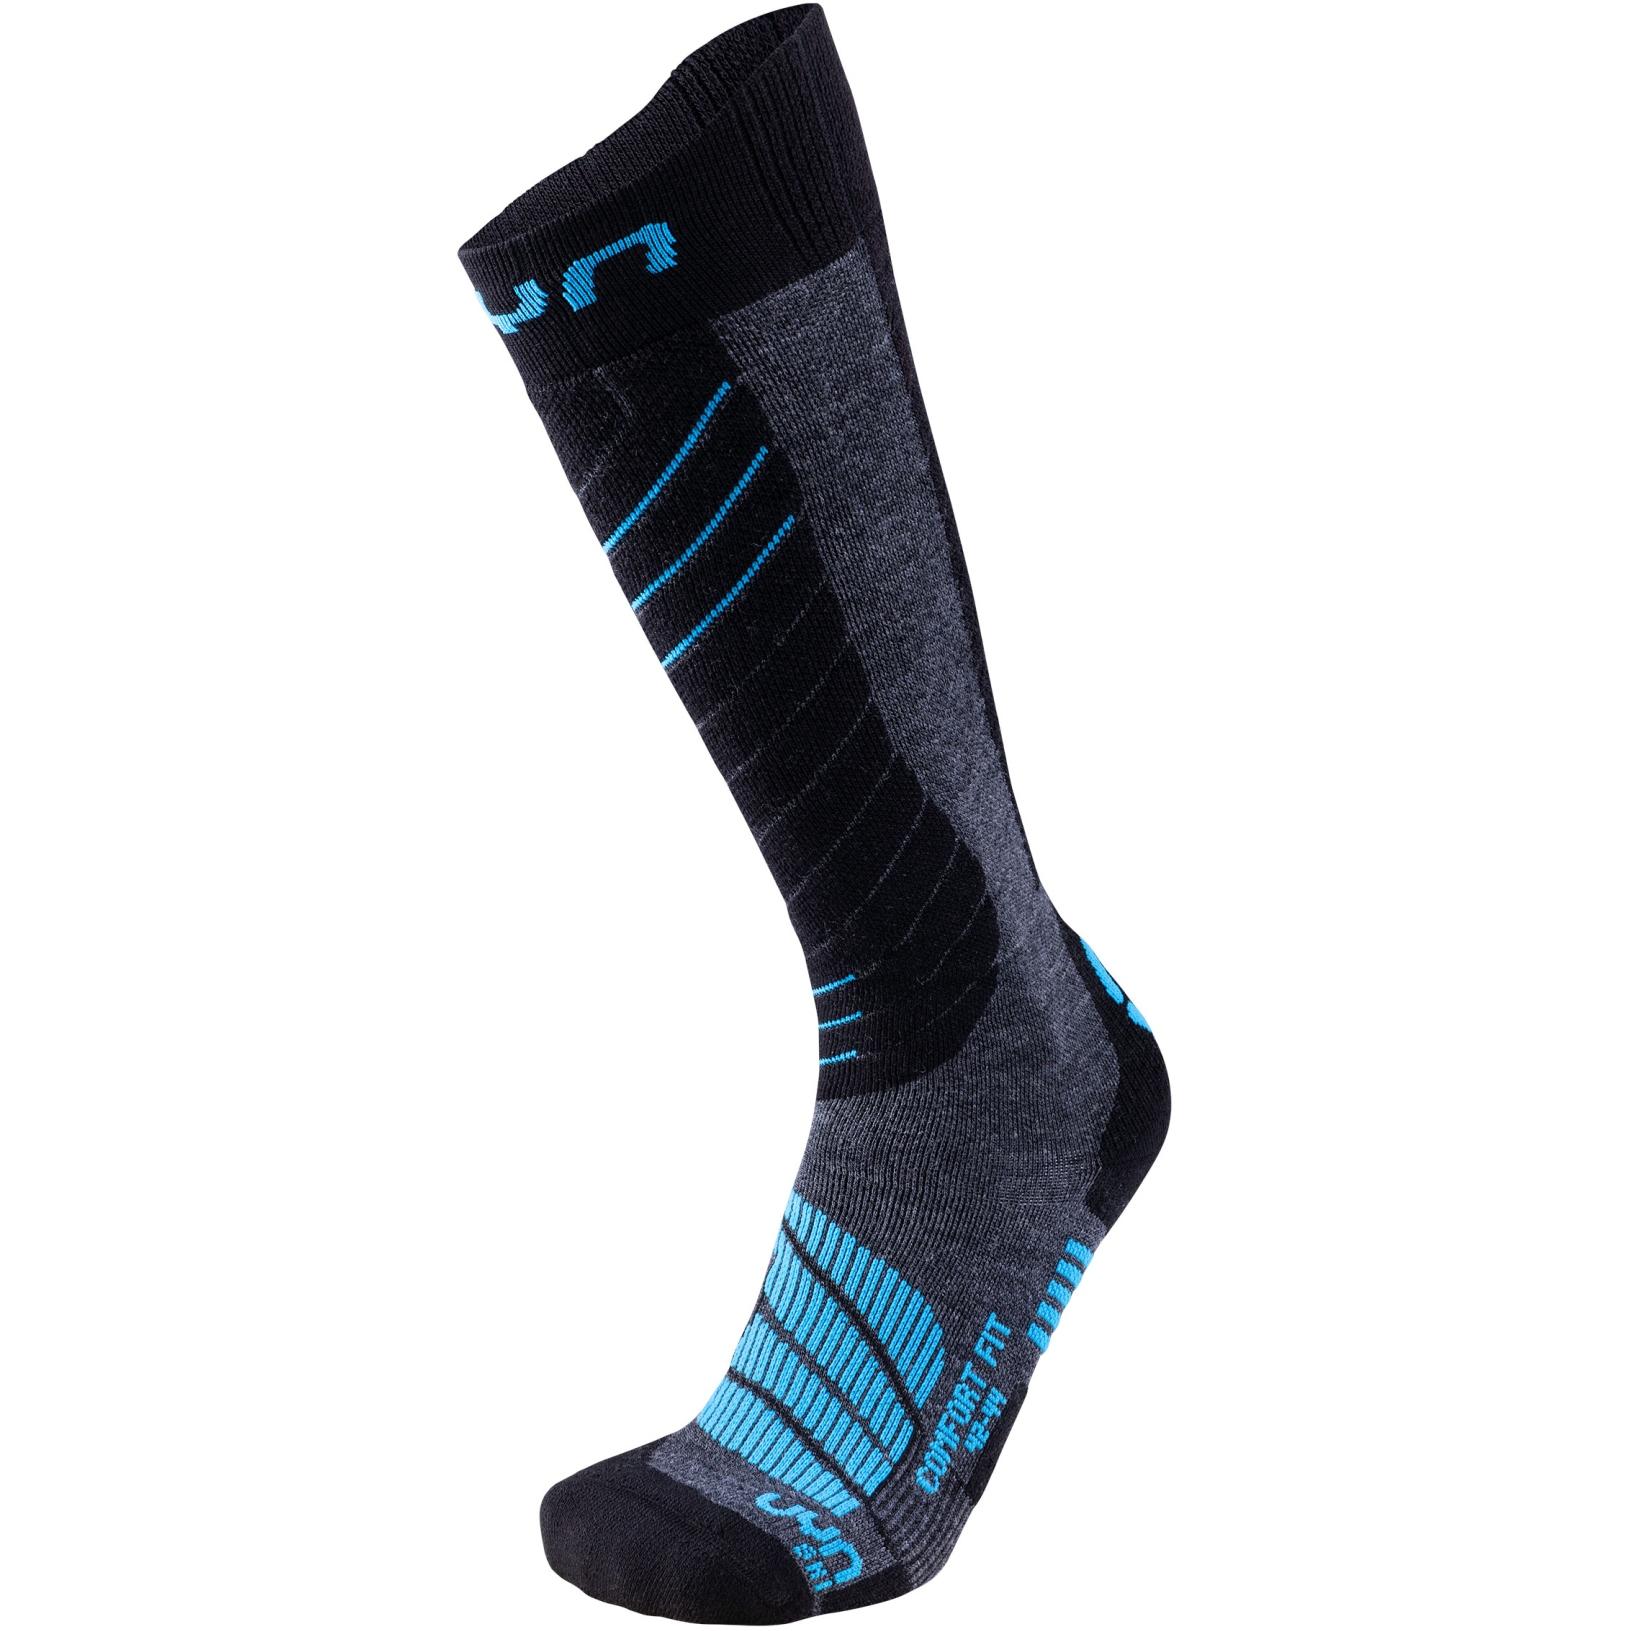 UYN Comfort Fit Men's Ski Socks - Medium Grey Melange/Azure